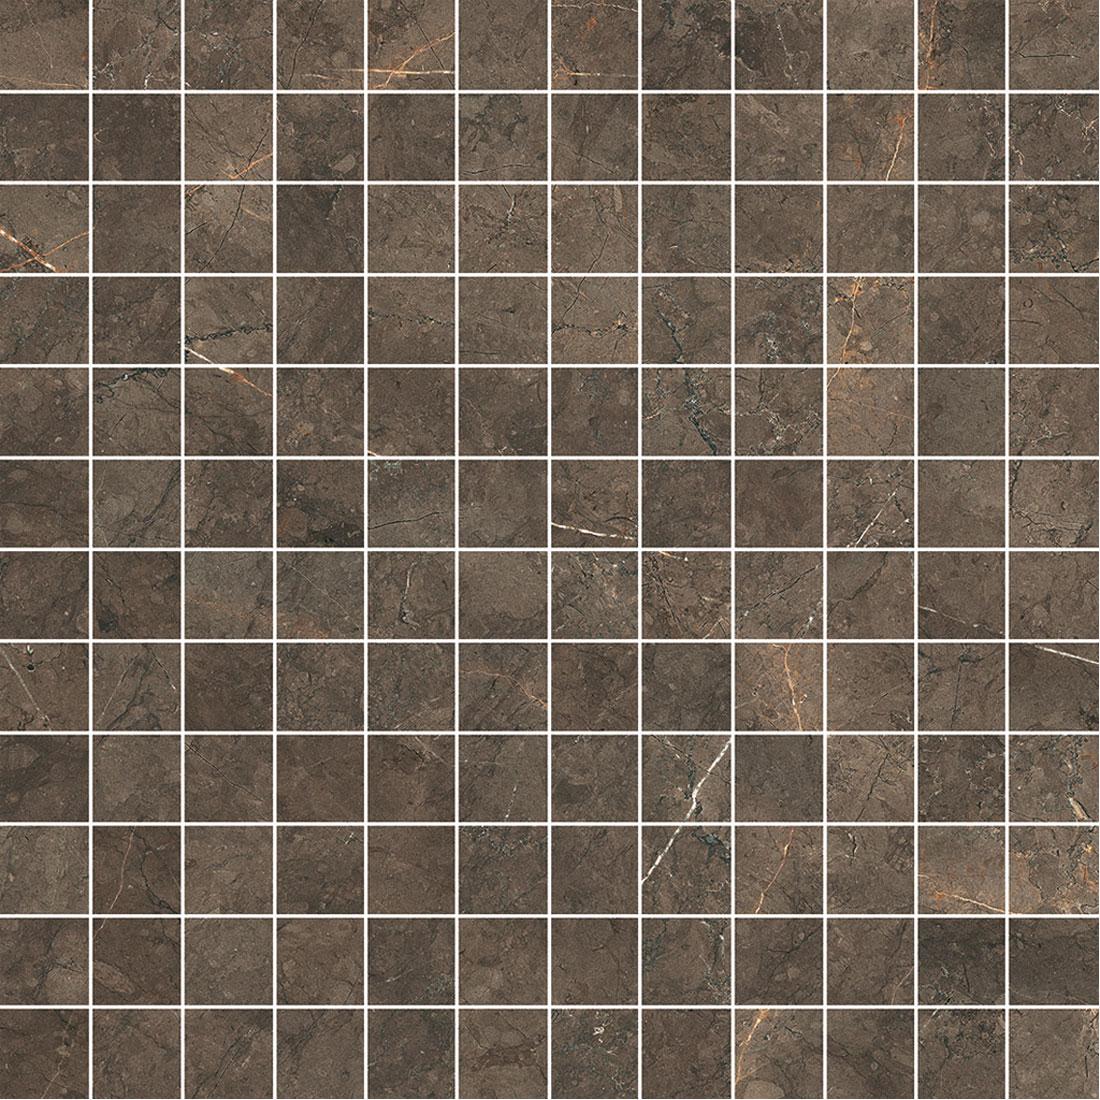 Mosaico 144T JW 06 LUC 30x30